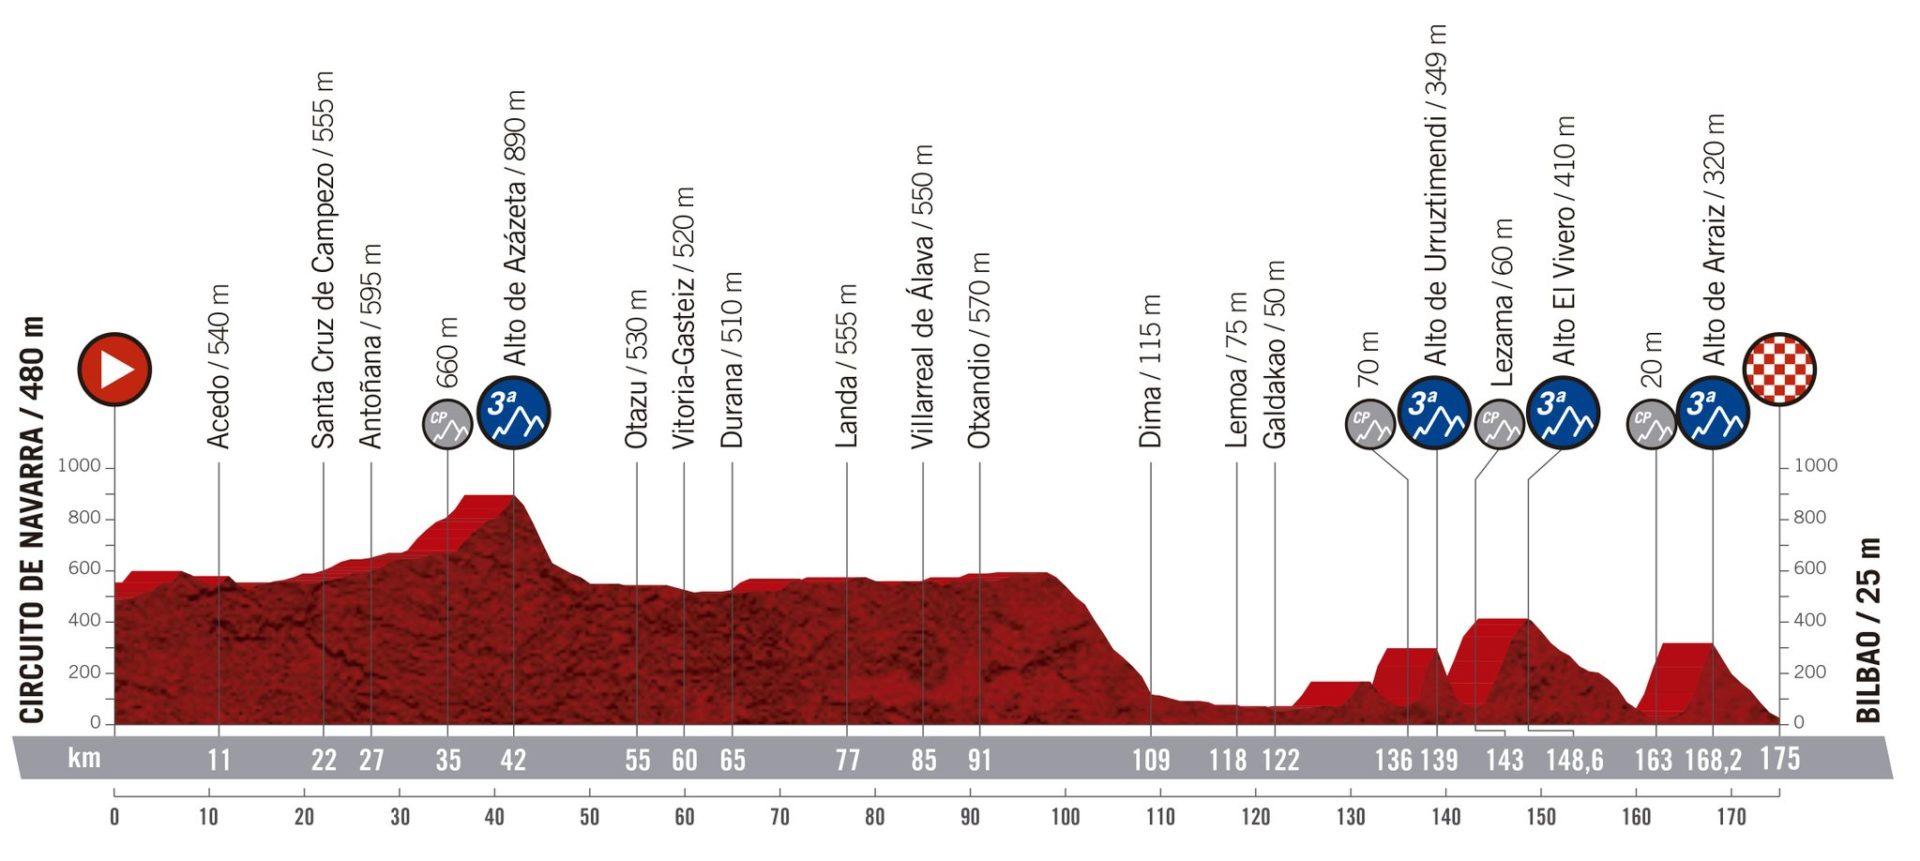 Circuito de Navarra – Bilbao. 175 kms